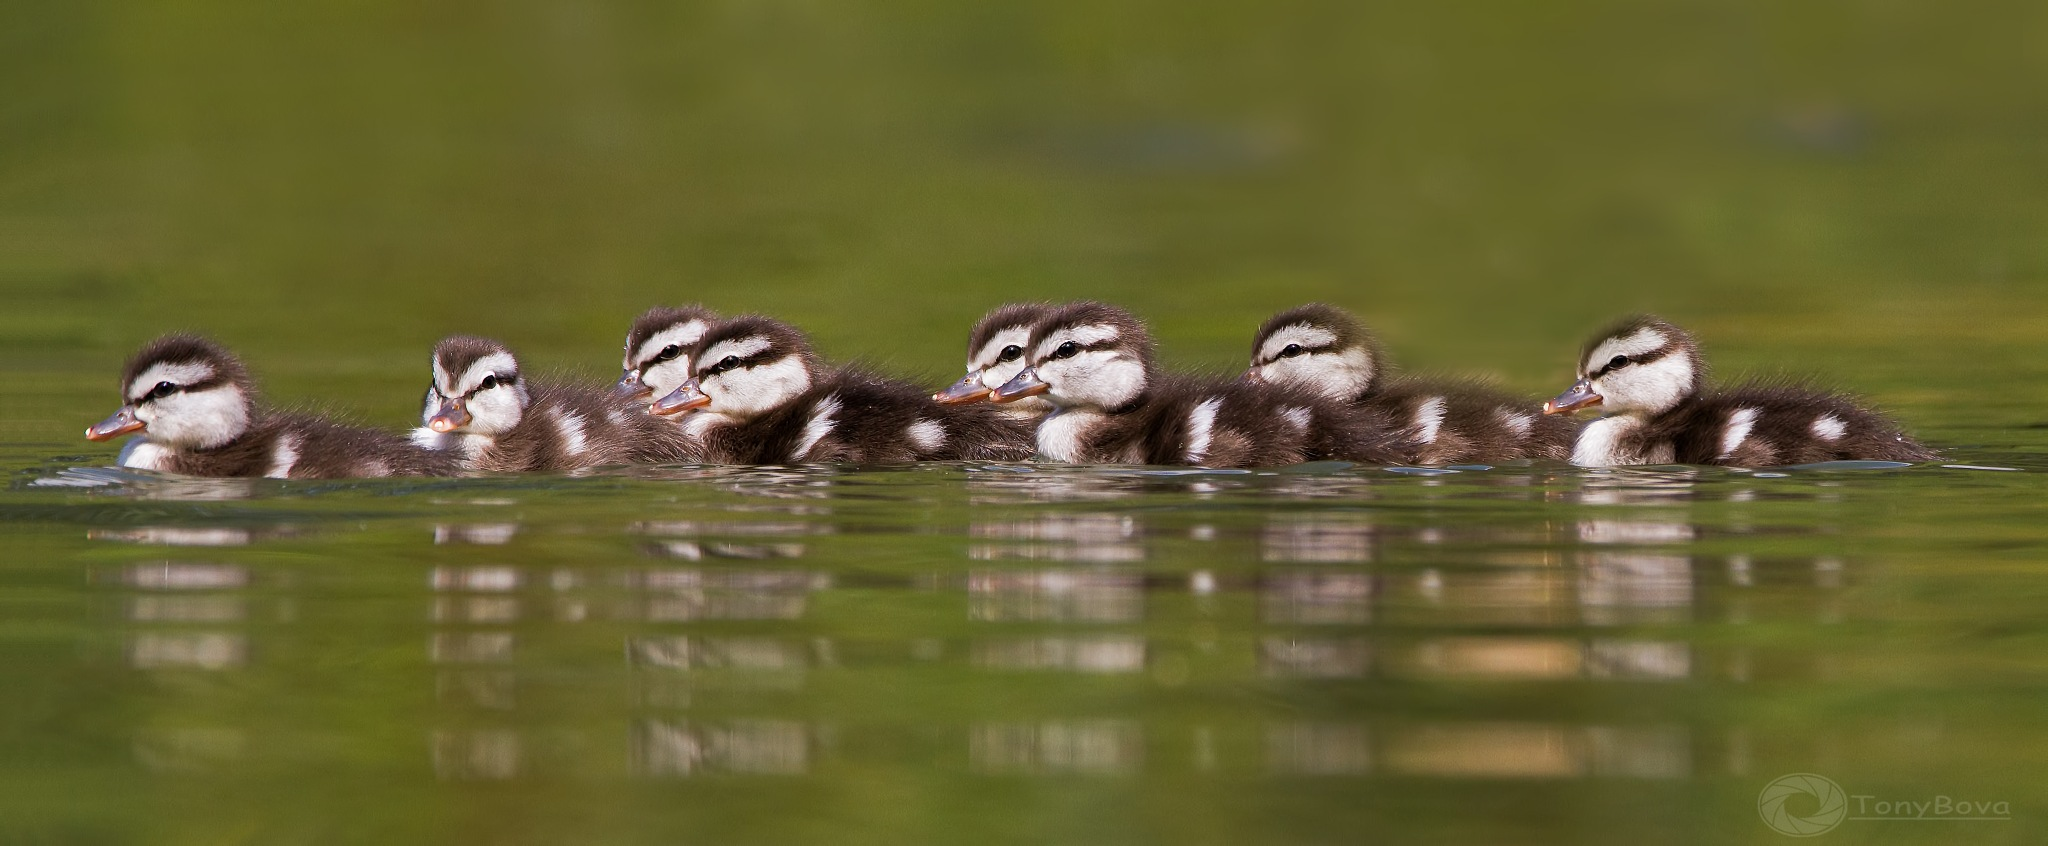 Tutti in fila .... by Tony Bova